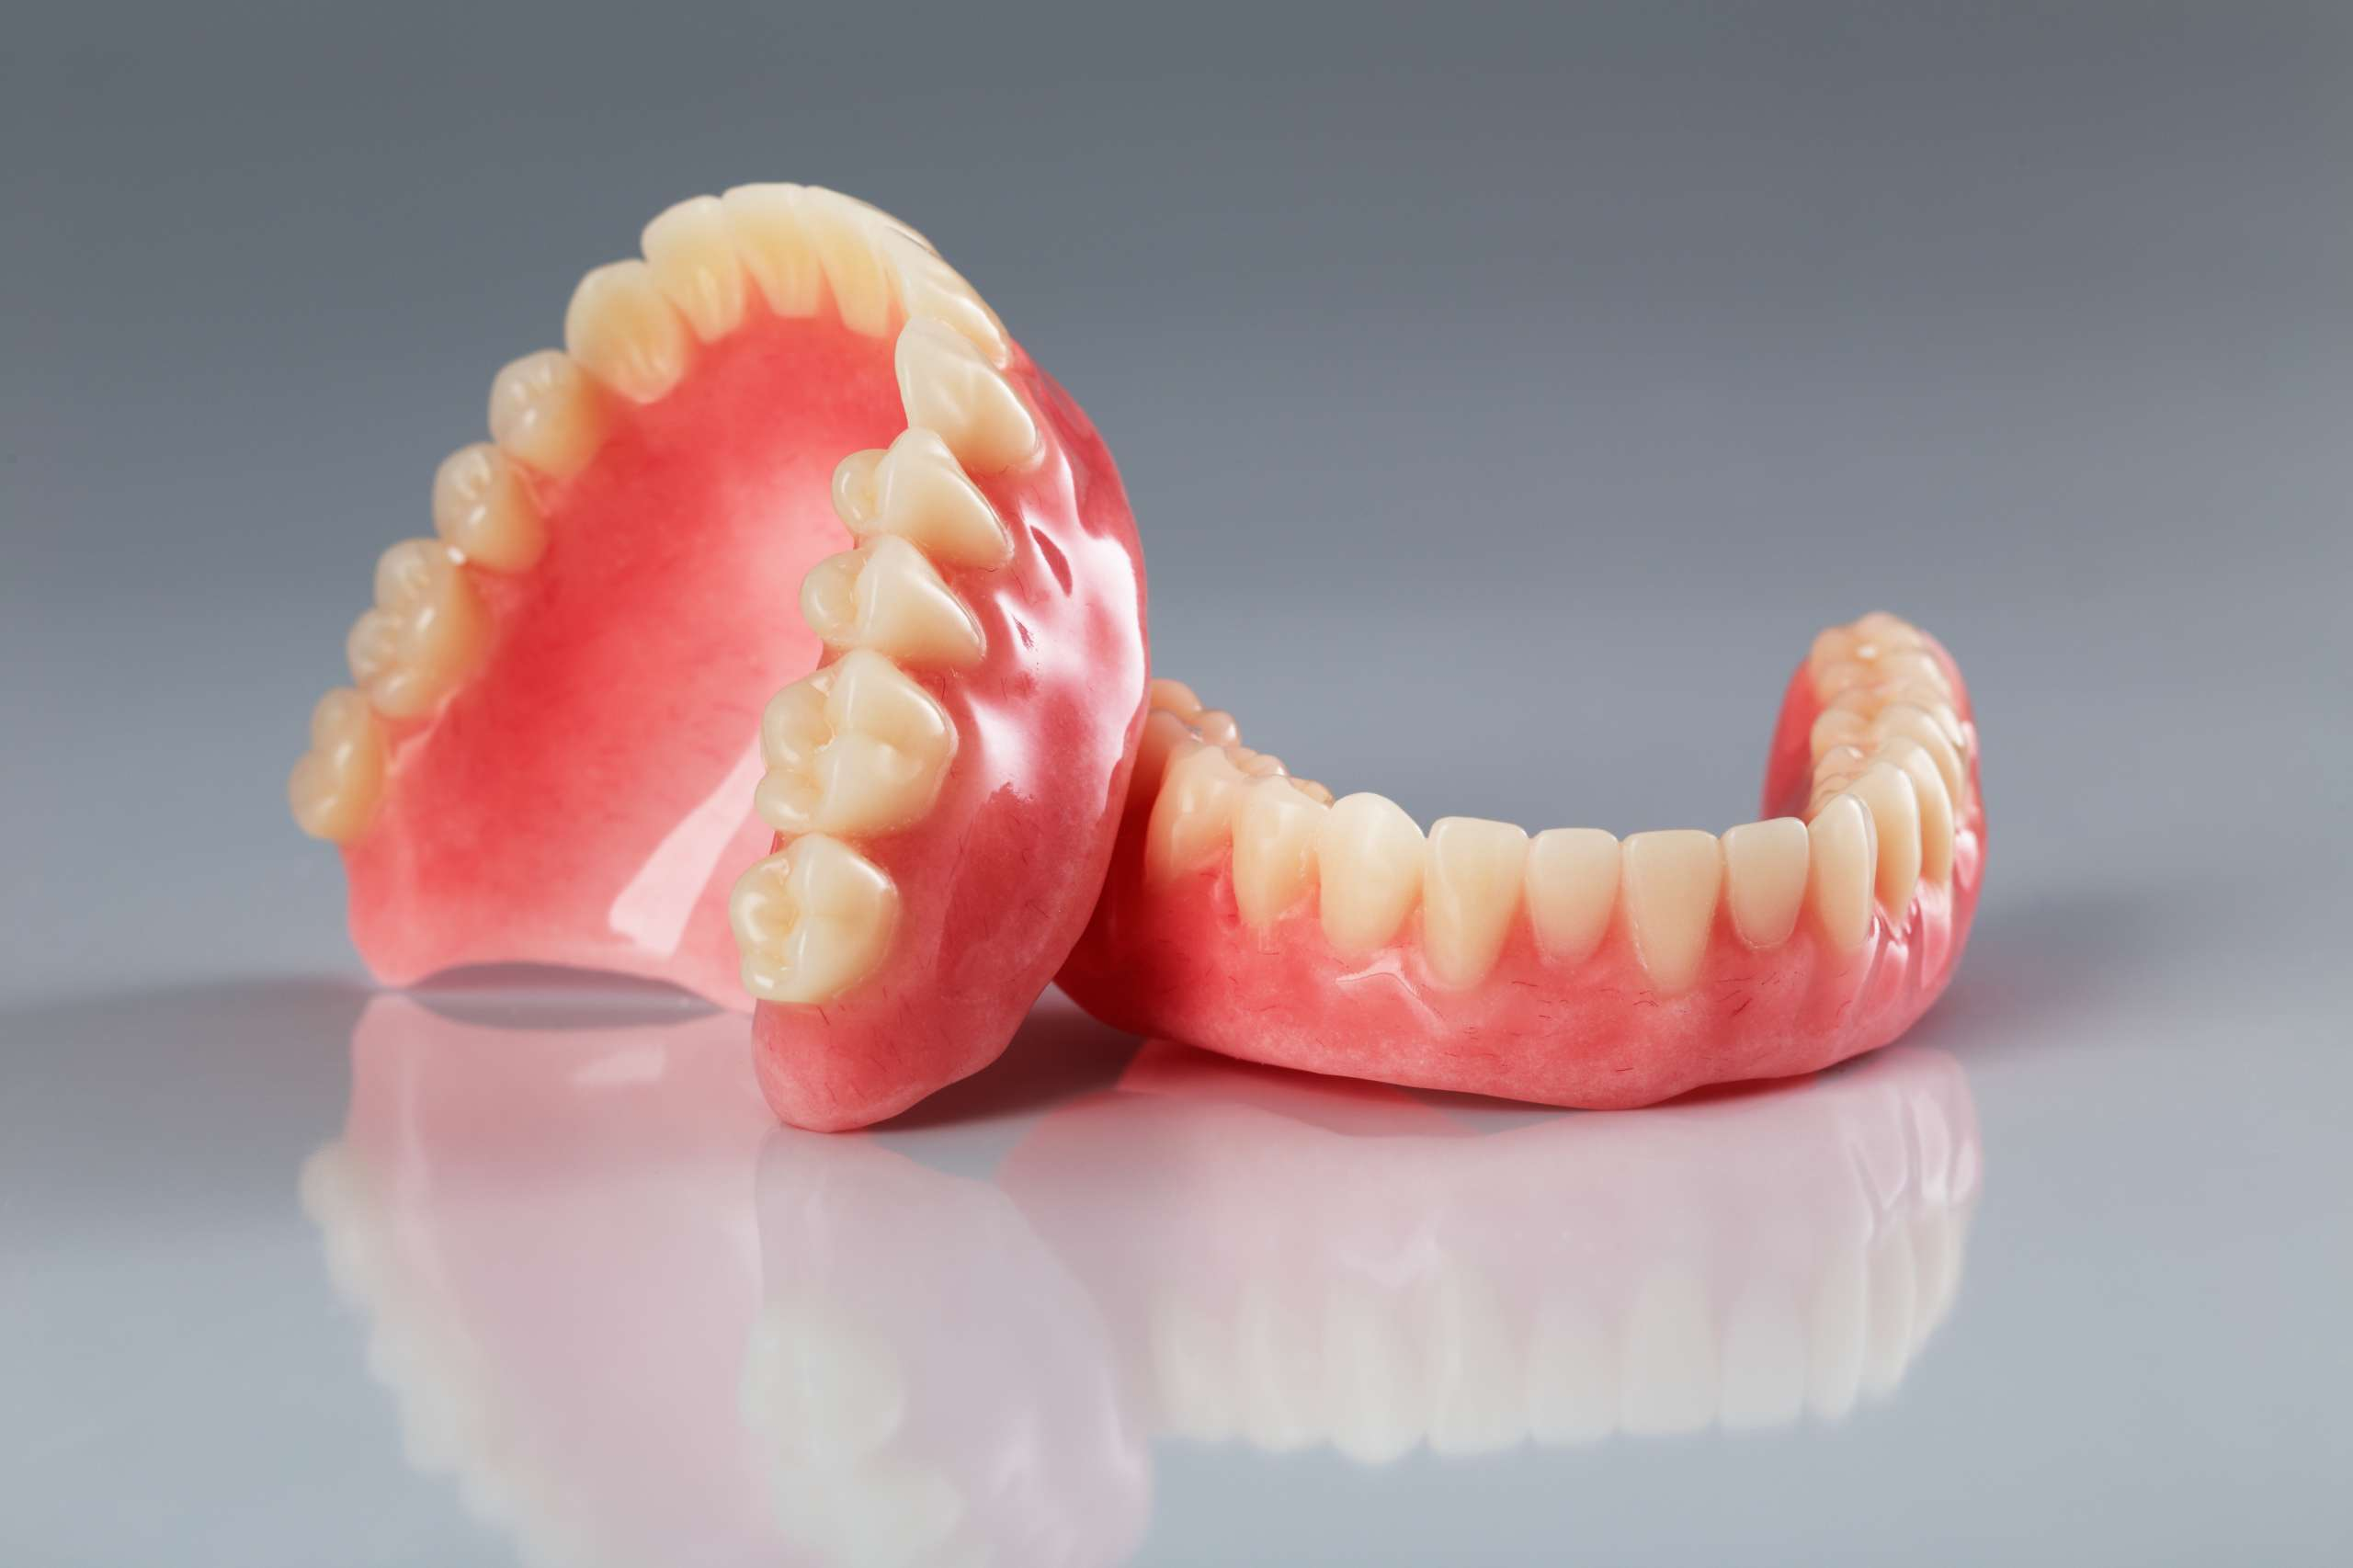 full-or-partial-dentures-winnipeg-dental-clinic